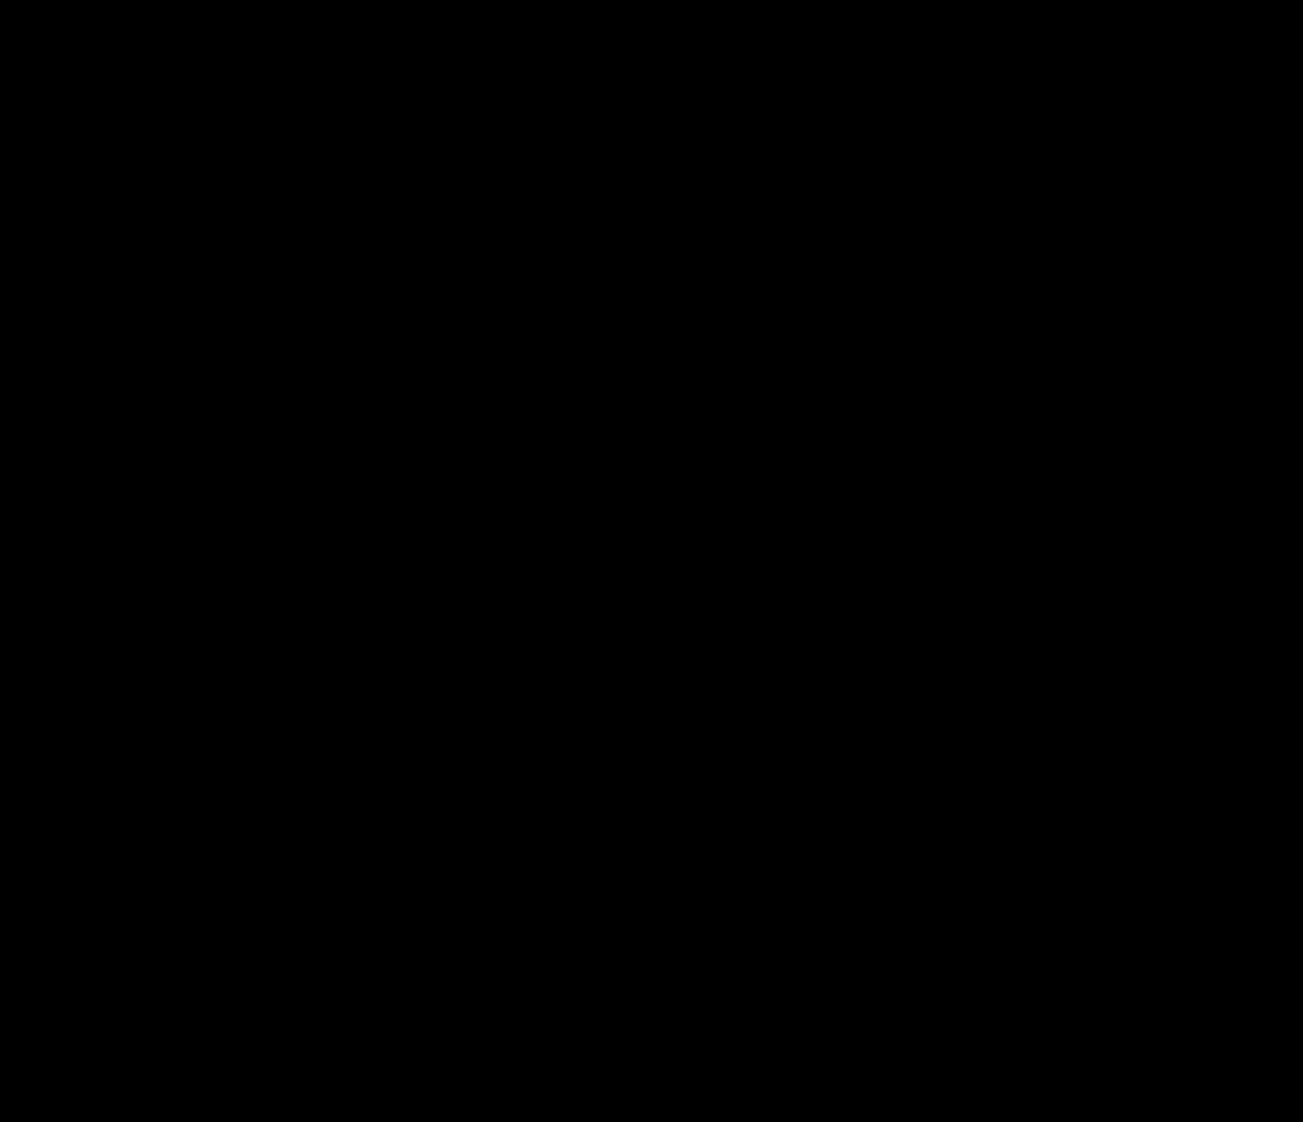 michiana-christian-camp-vertical-black.png